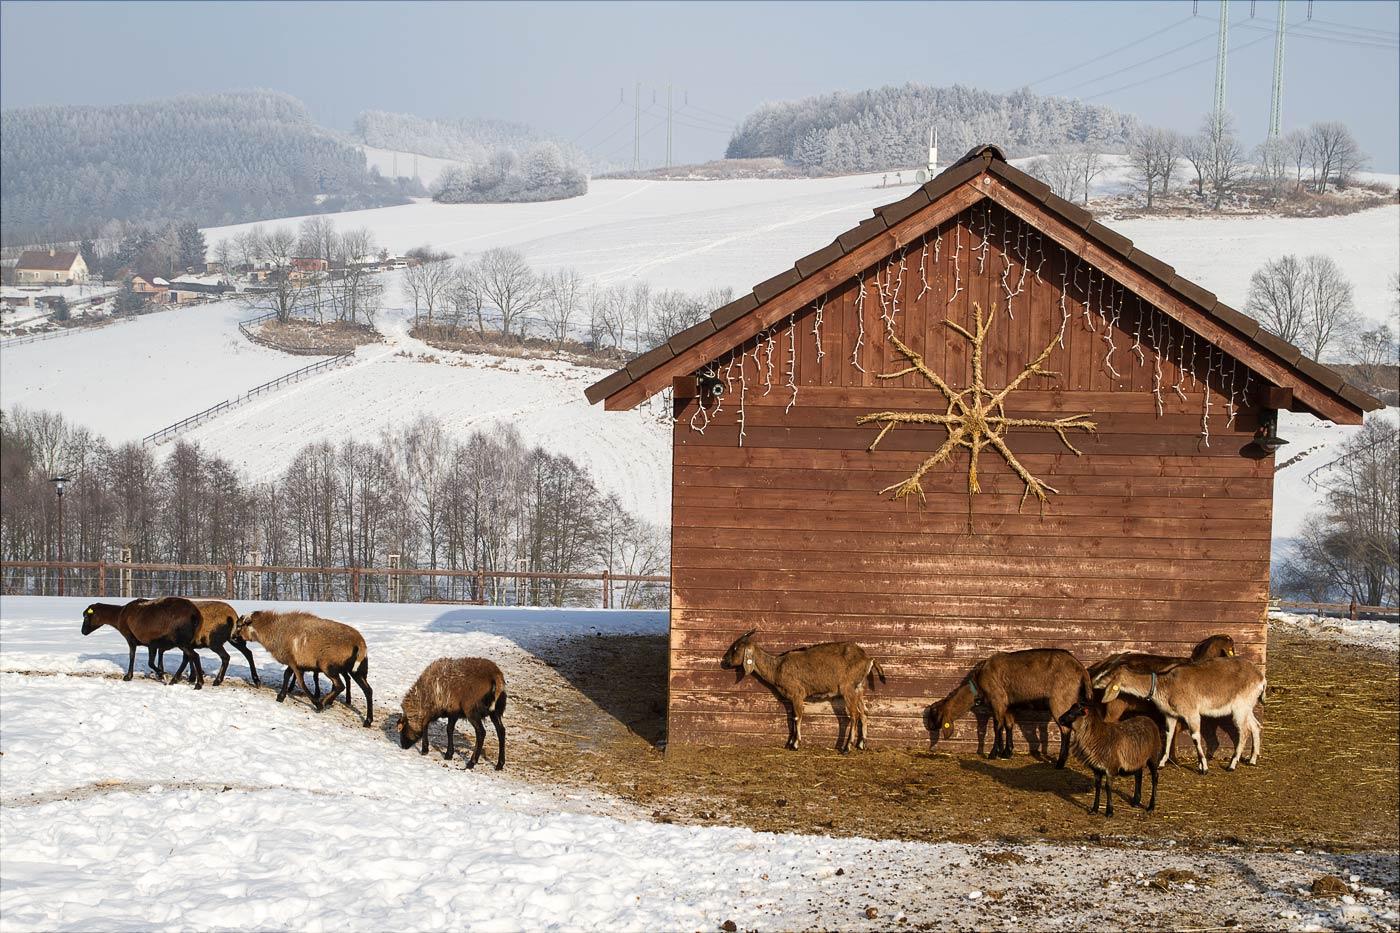 http://countryczech.com/wp-content/uploads/2017/02/photos/20170129-122818_Farmapark_Sobehrdy-2.jpg